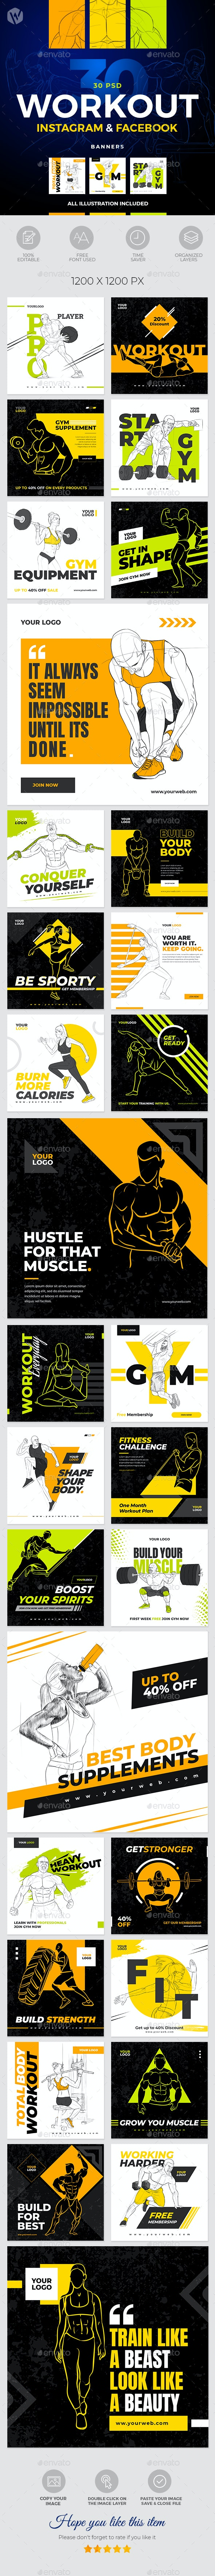 30 Instagram & Facebook Fitness GYM Workout Banners - Social Media Web Elements